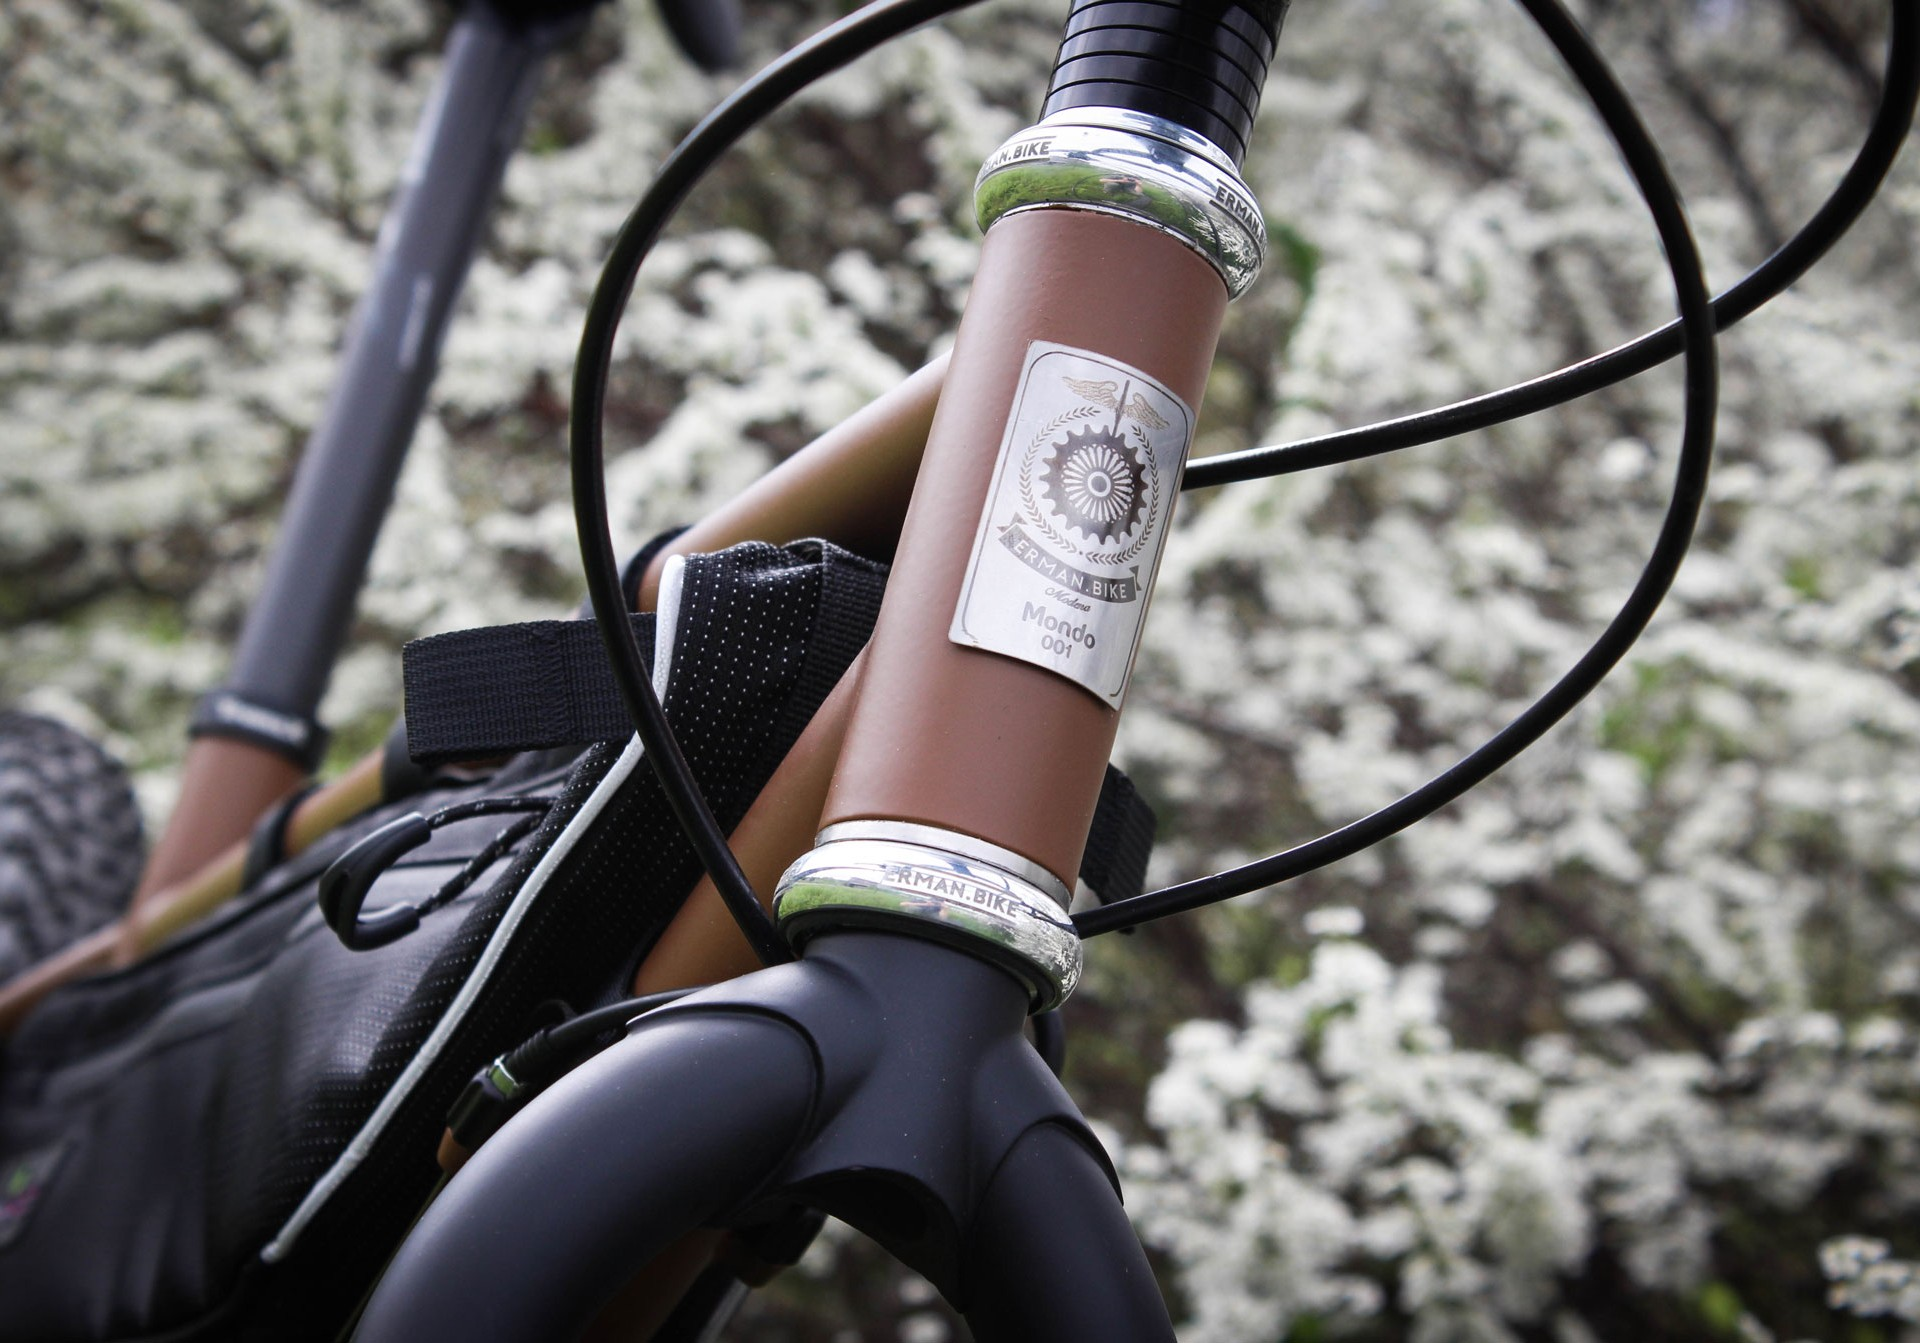 mondo adventure bikepacking handmade bicycle by erman.bike modena